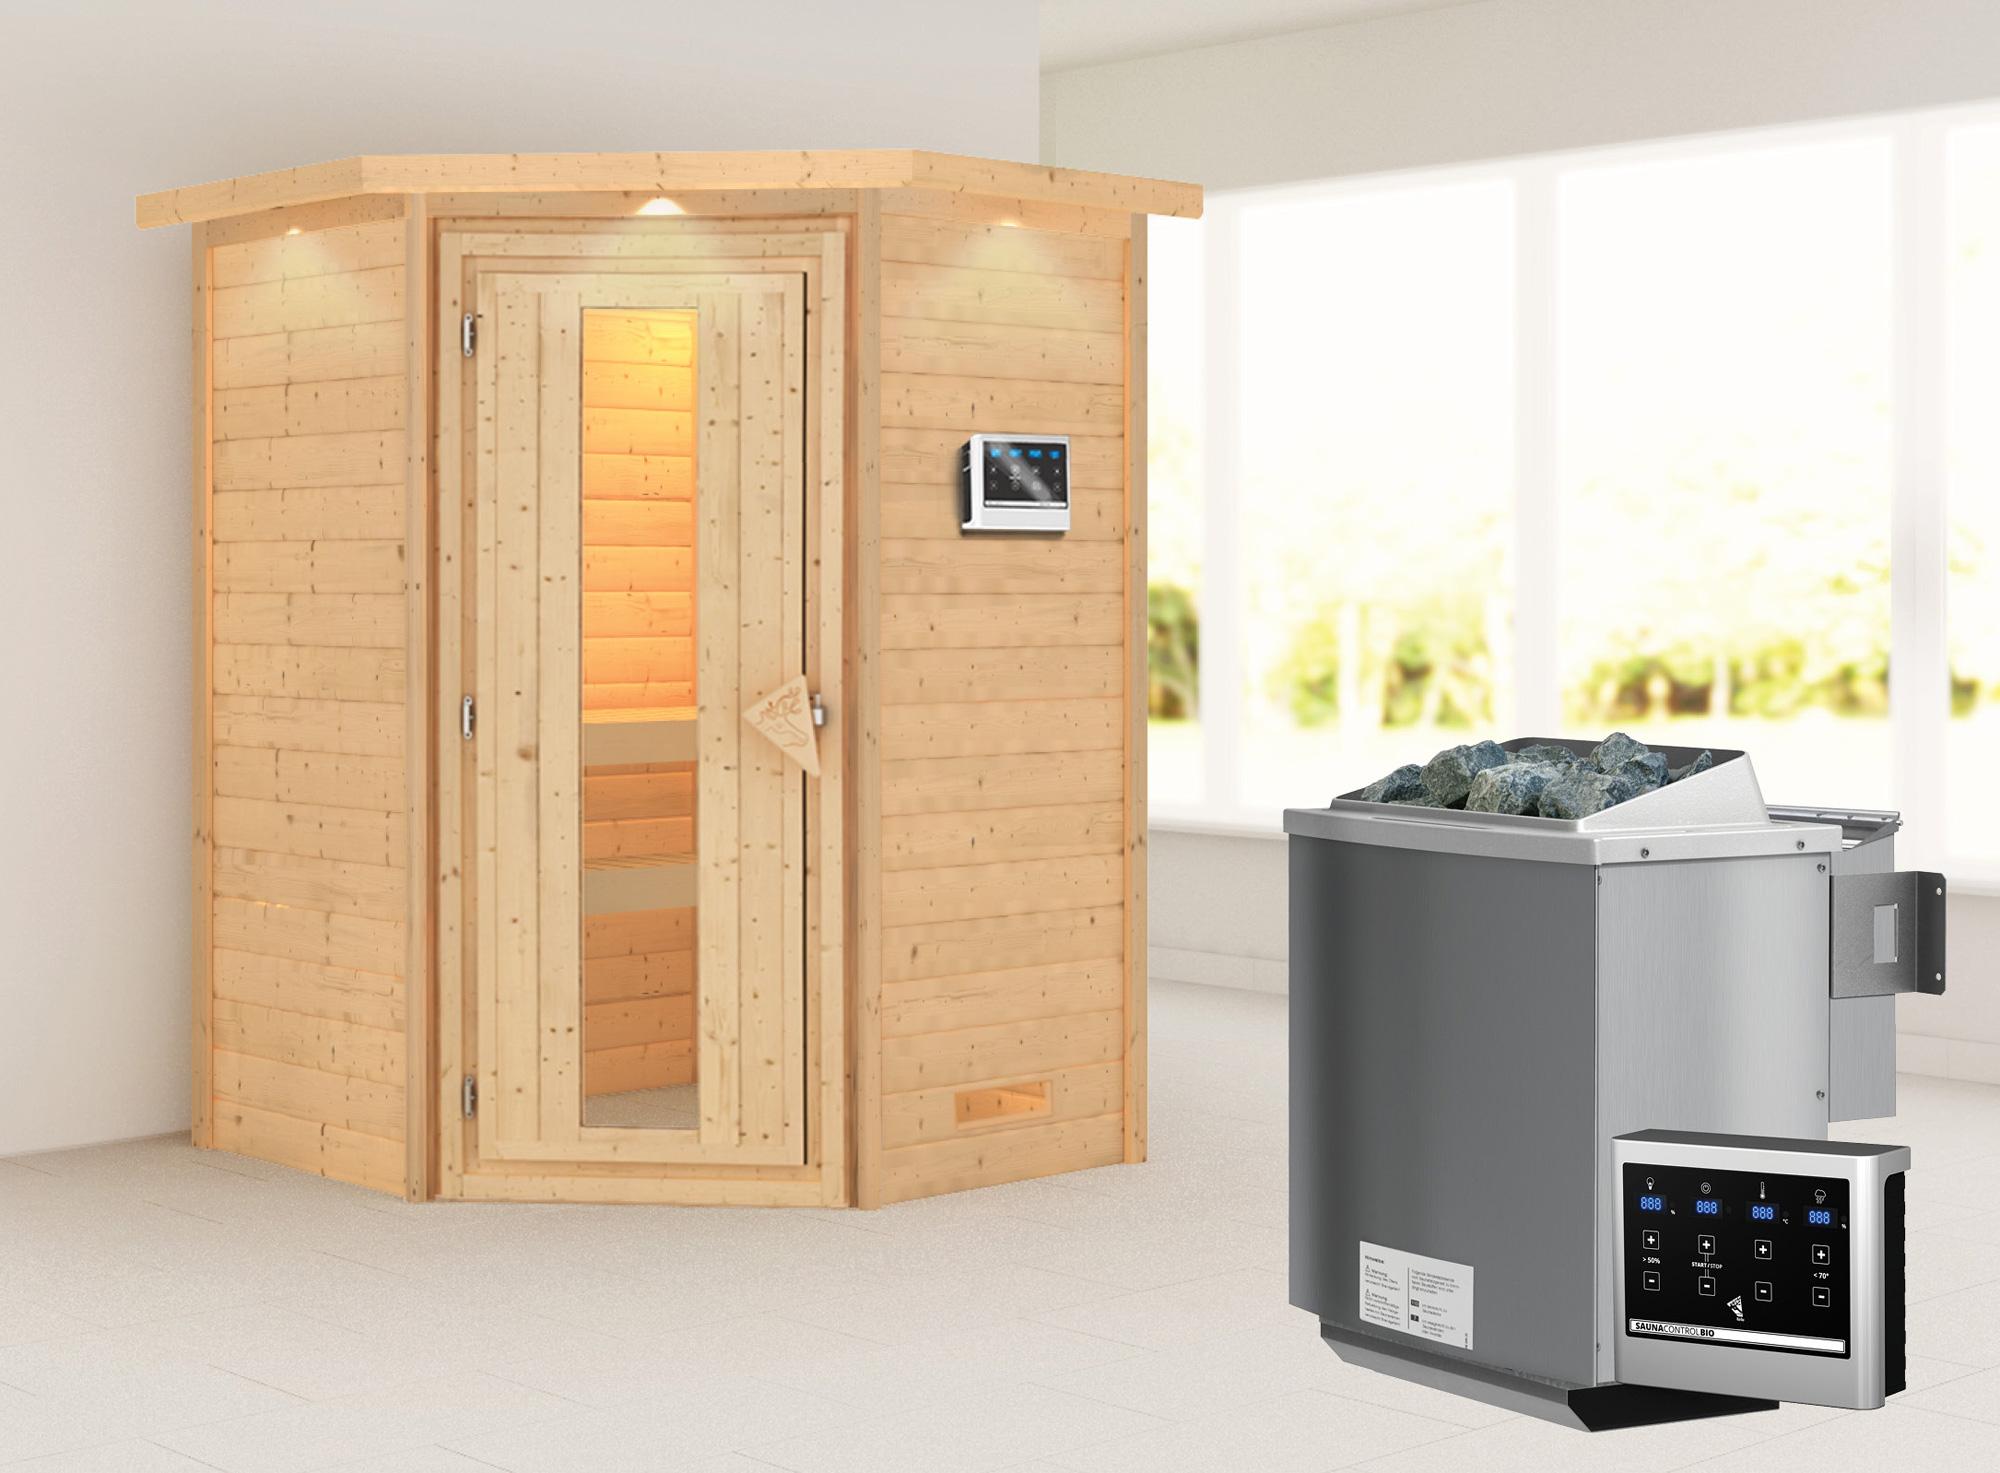 Woodfeeling Sauna Franka 38mm Bio Saunaofen 9kW ext. Kranz Holztür Bild 1